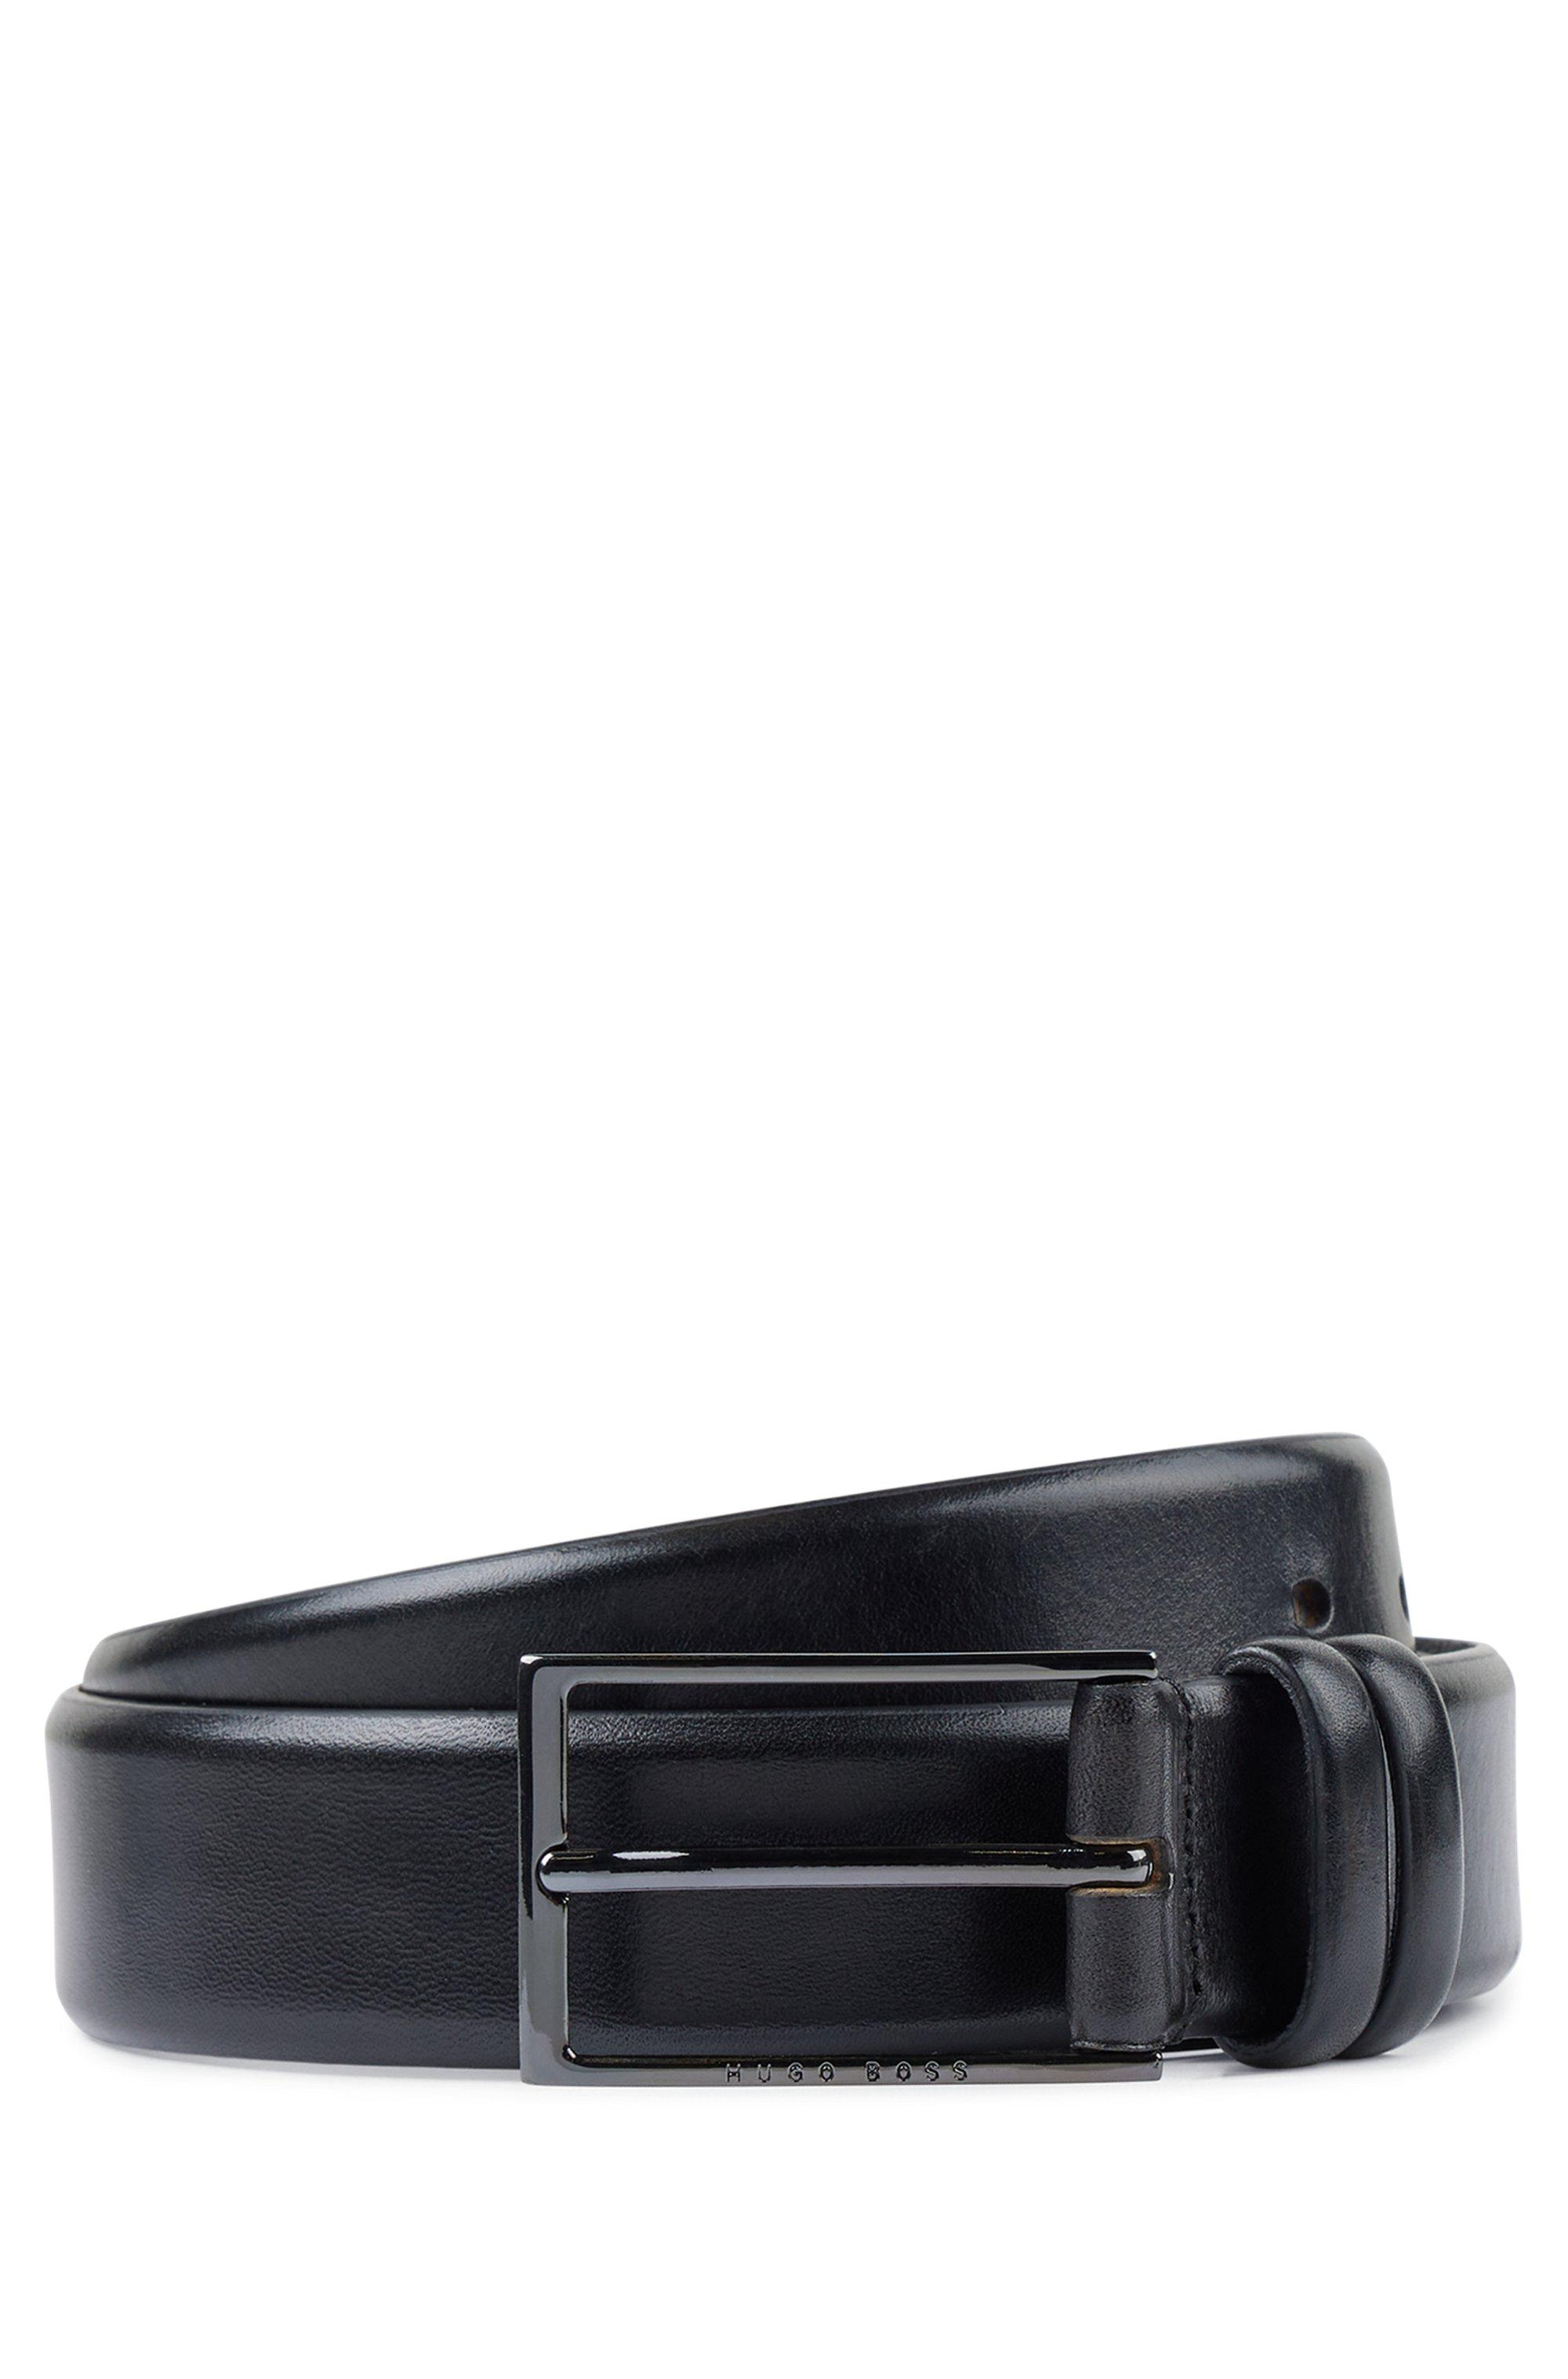 Vegetable-tanned leather belt with gunmetal hardware, Black